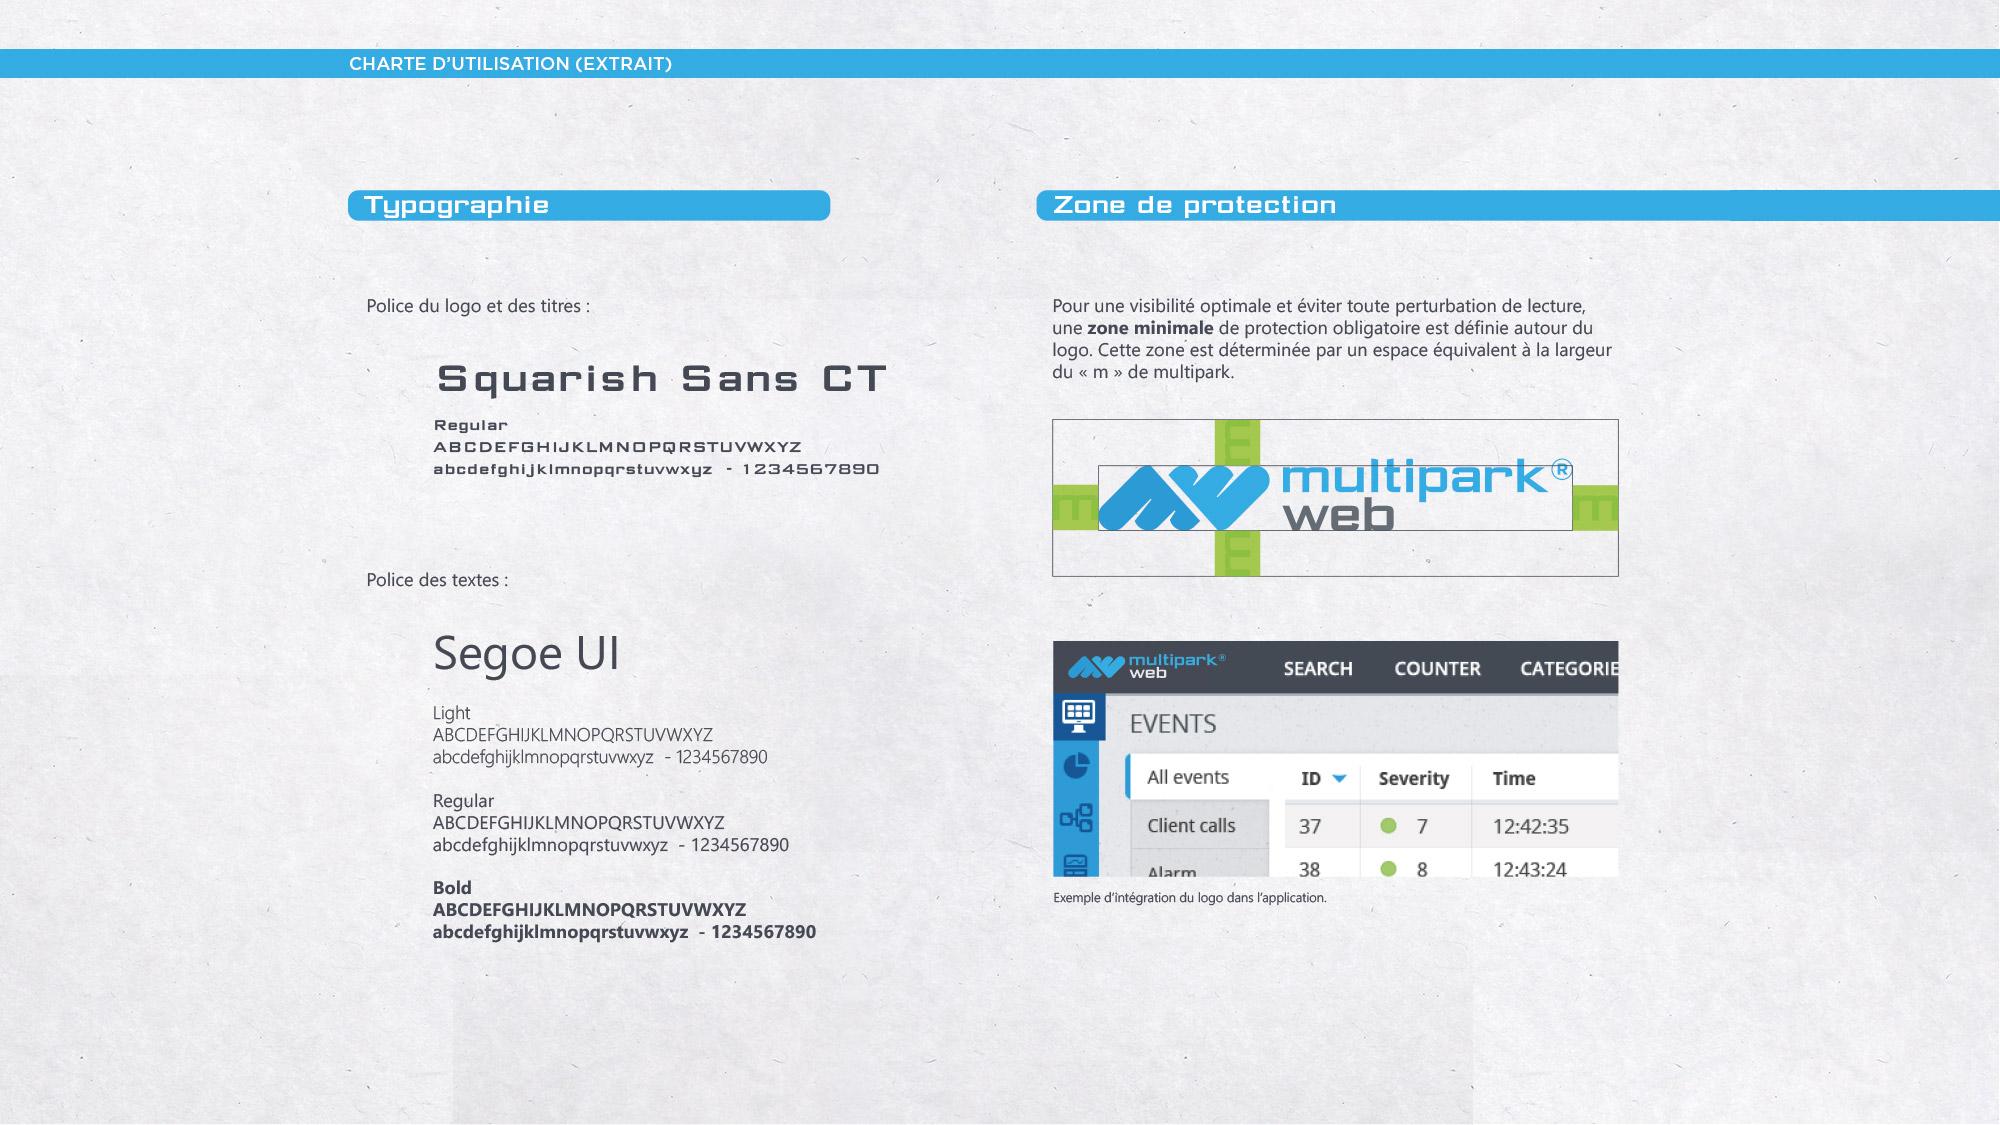 MultiparkWeb_Rea_Logo3_Charte.jpg